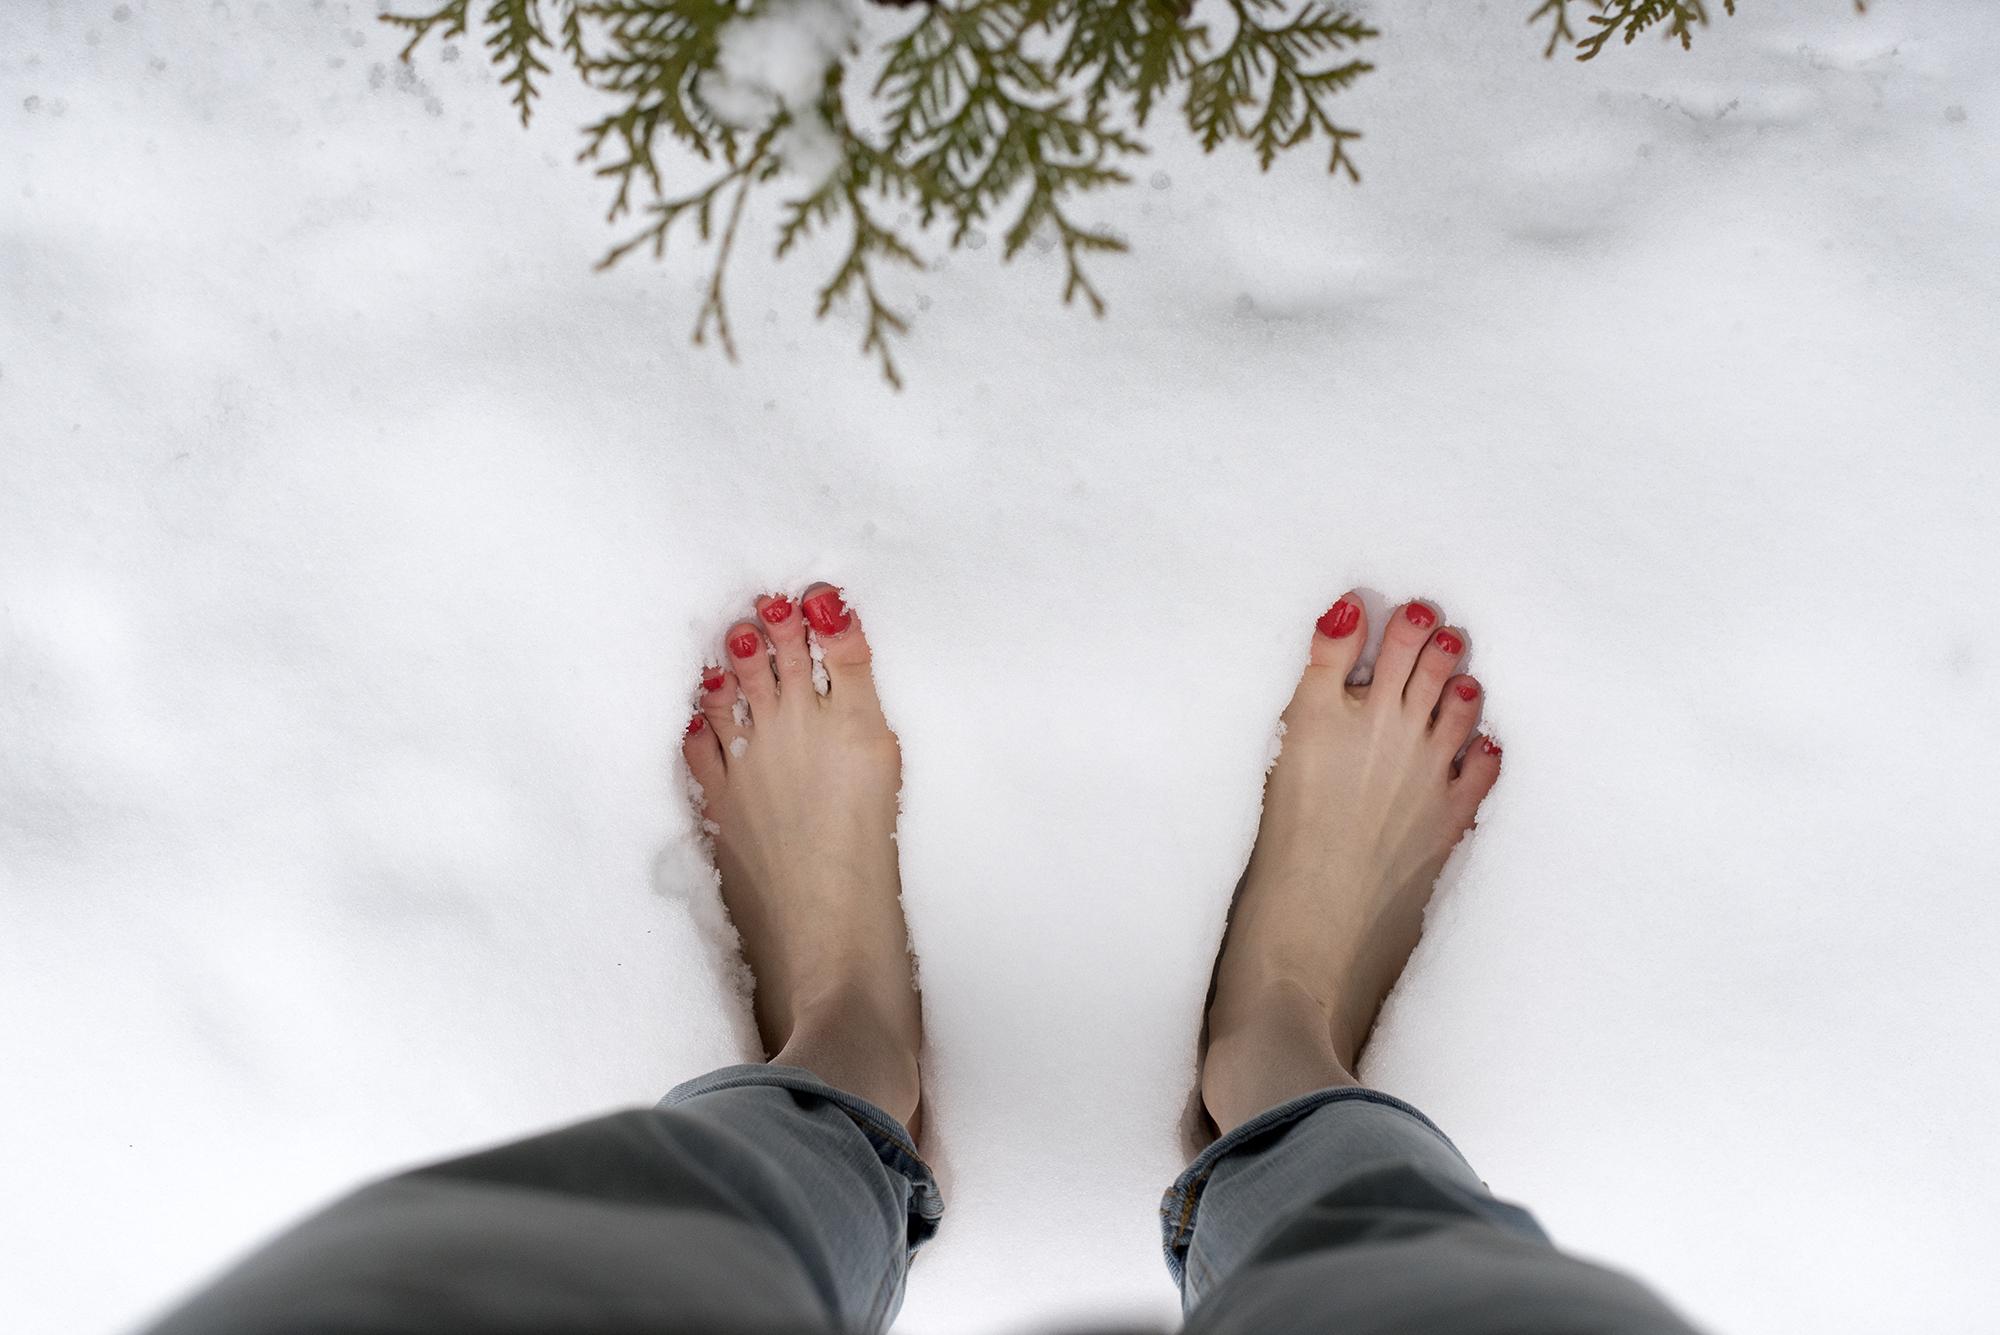 Soins des pieds recommandés en hiver